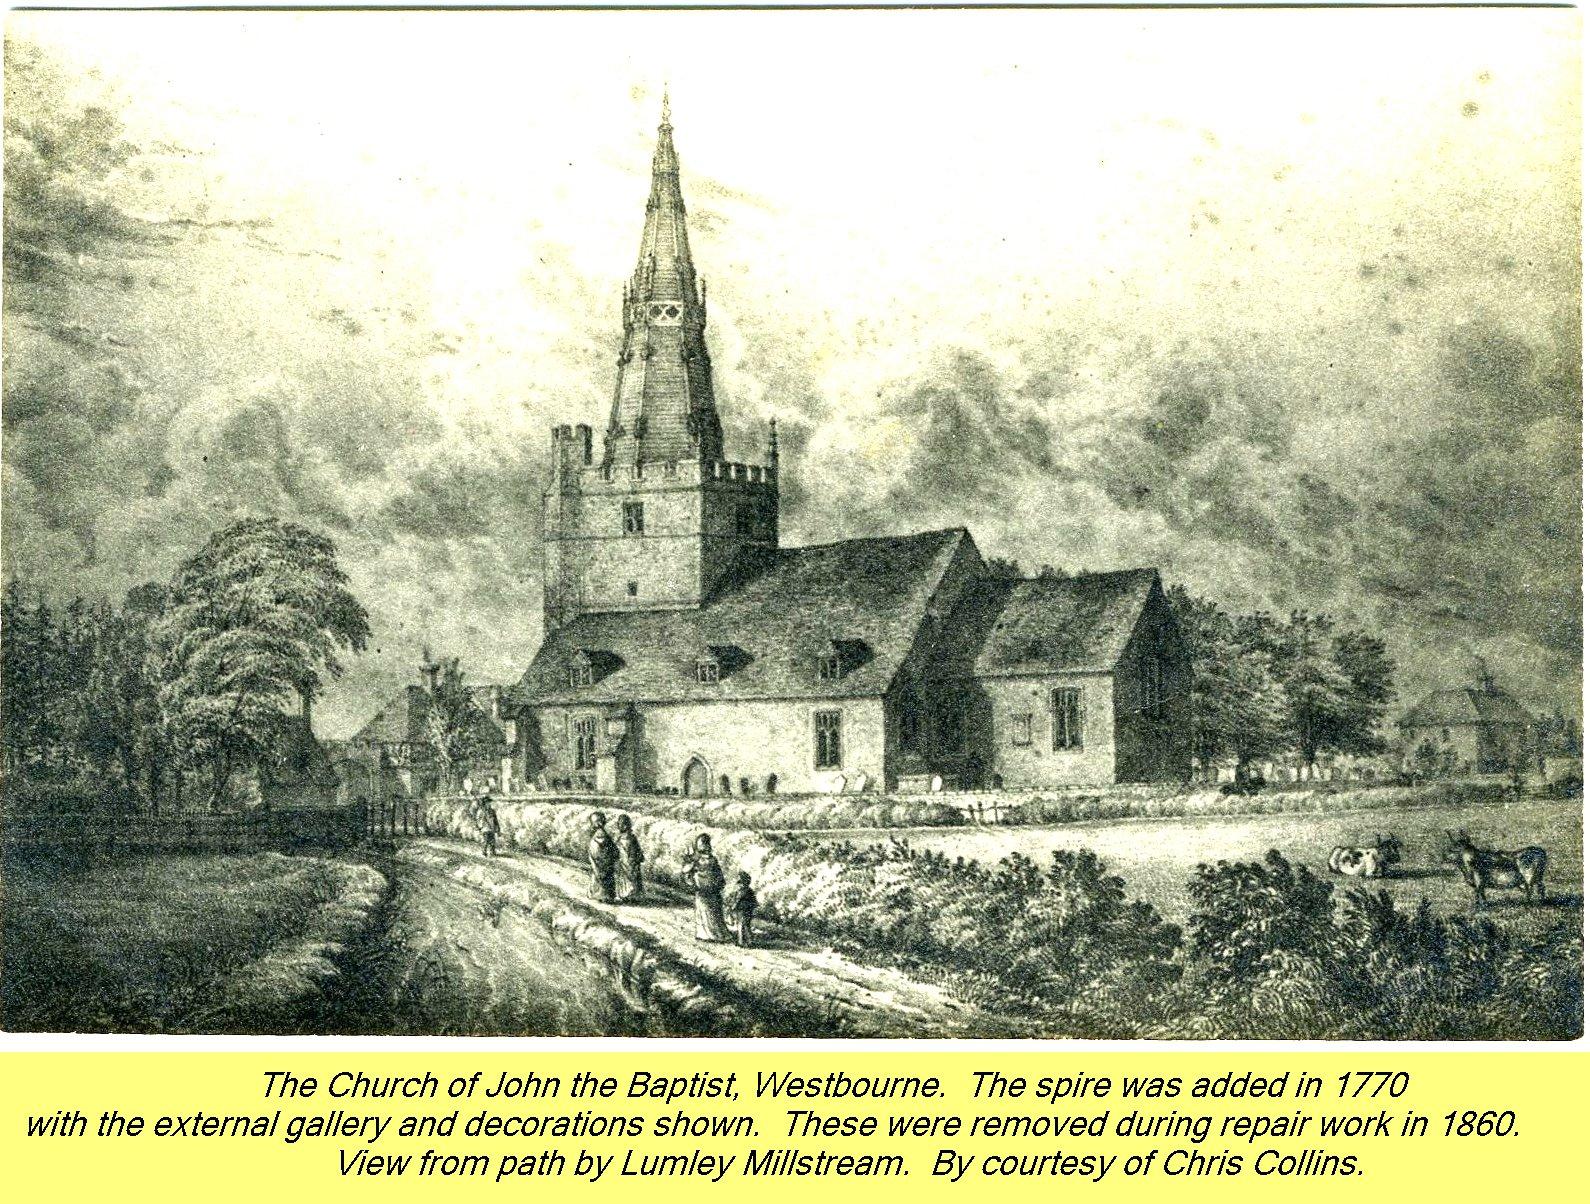 WESTBOURNE HISTORY PHOTO, CHURCH, St. JOHN, YEW, SPIRE, 1770, LUMLEY MILLSTREAM